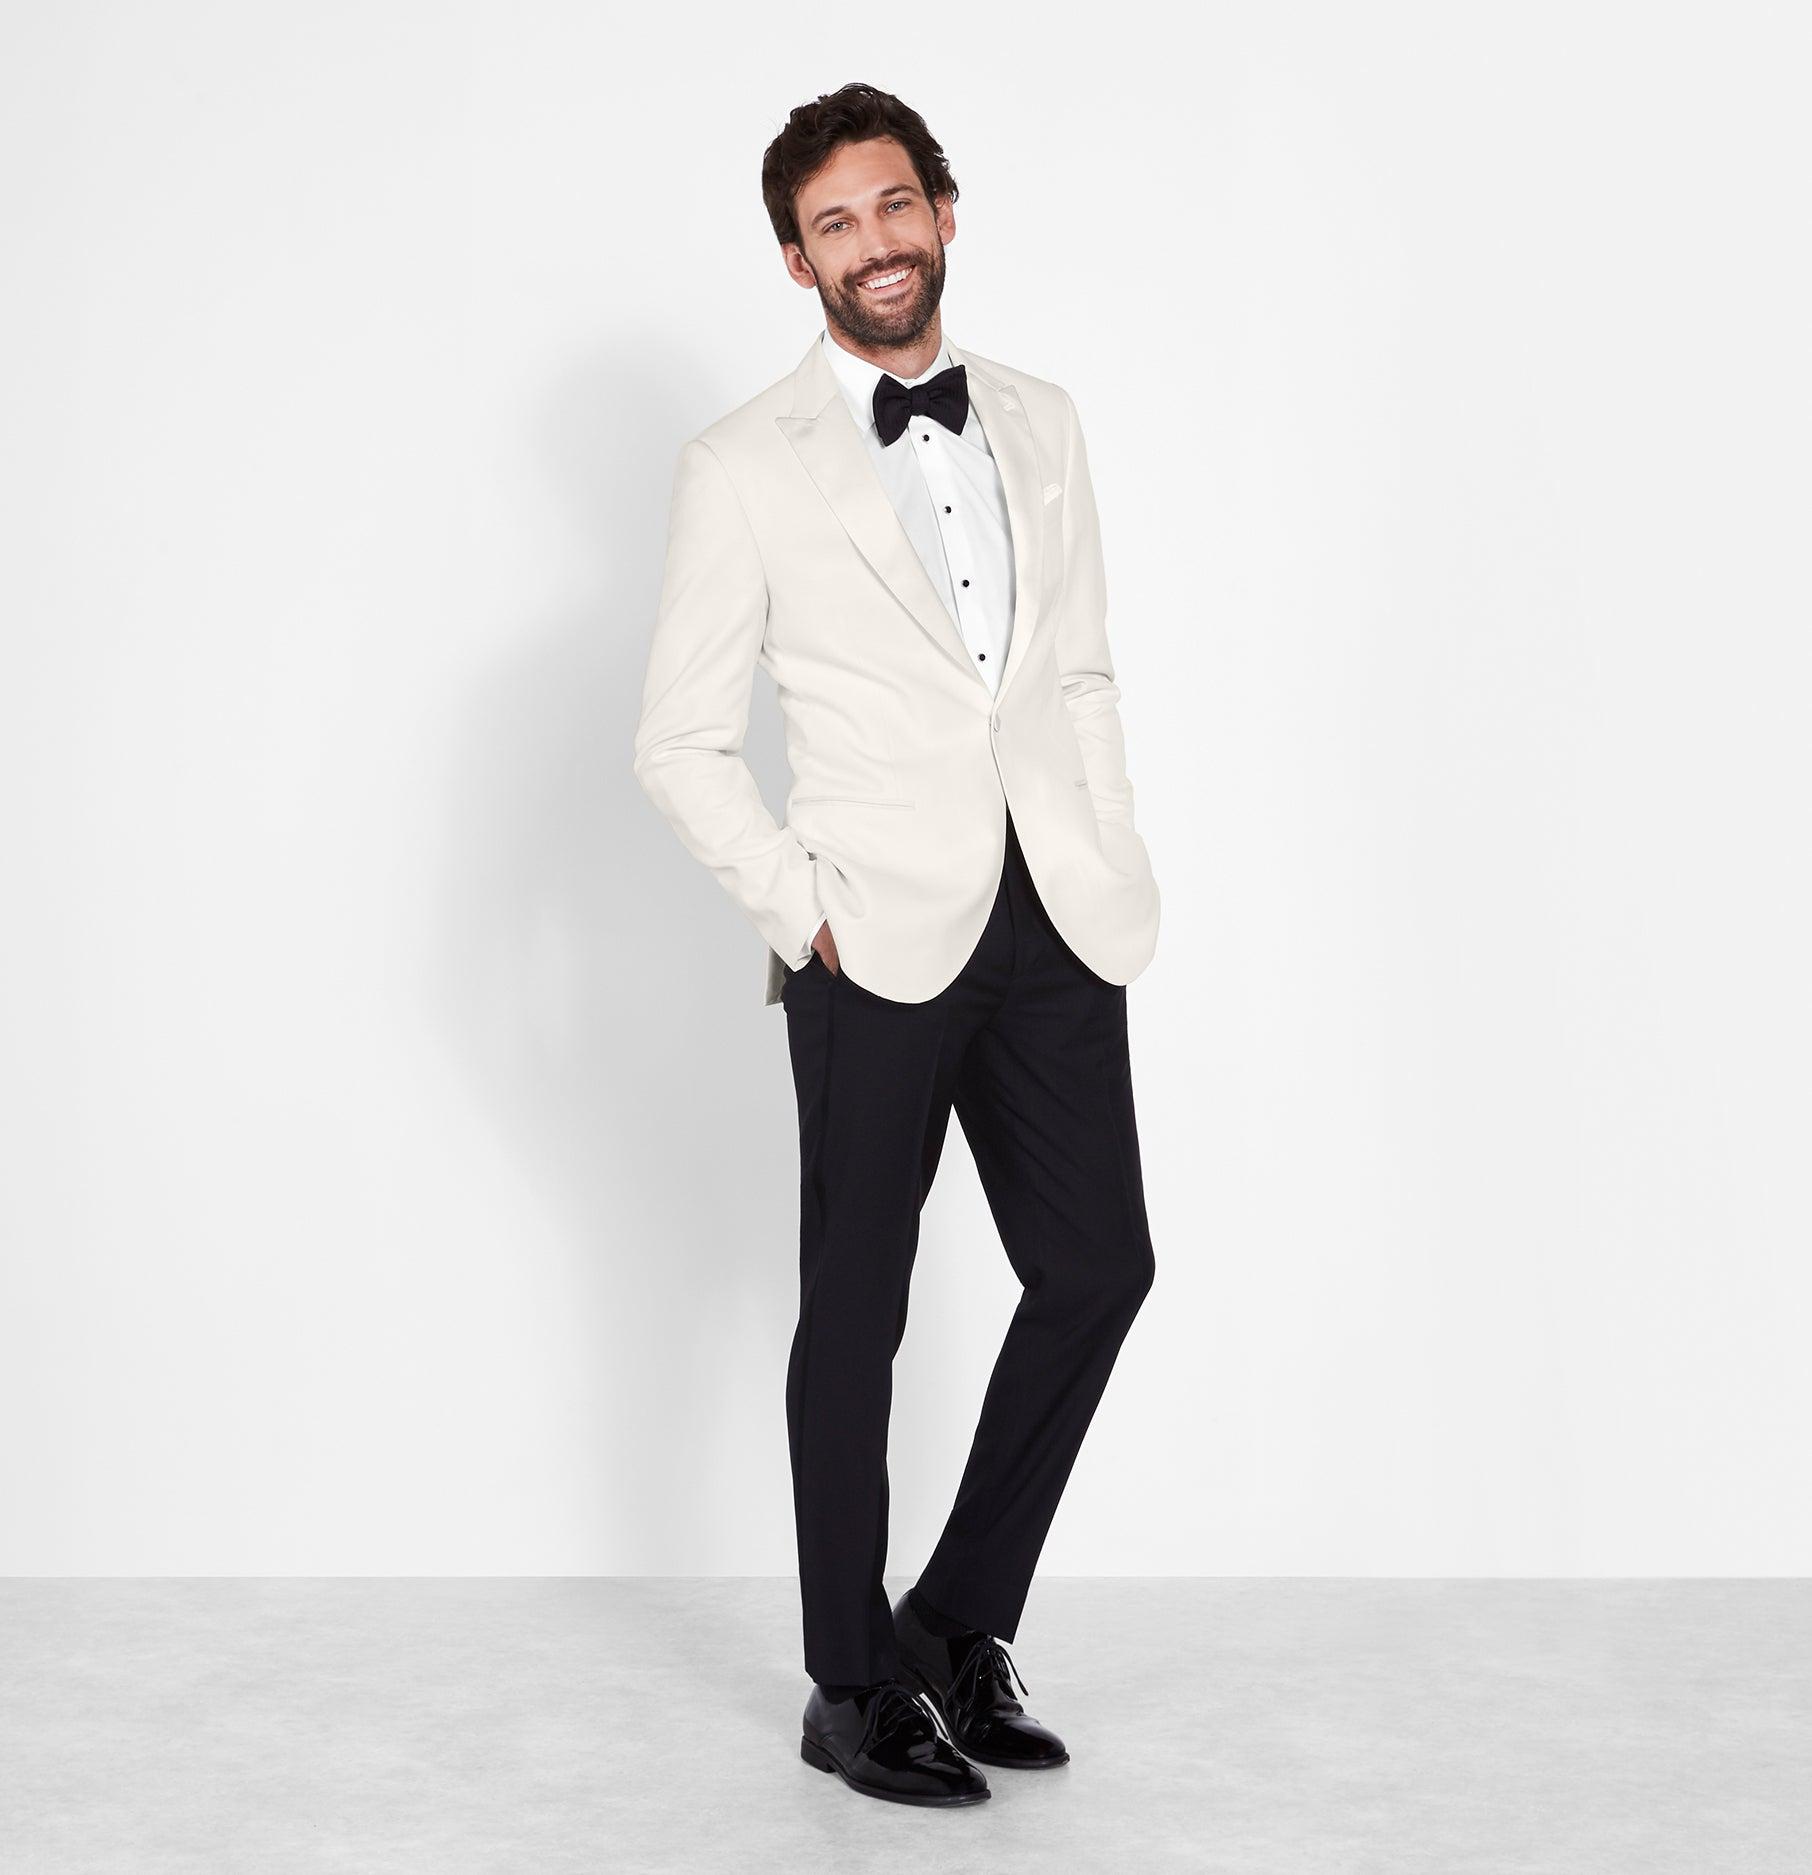 f5a03706275 White Dinner Jacket Tuxedo | The Black Tux